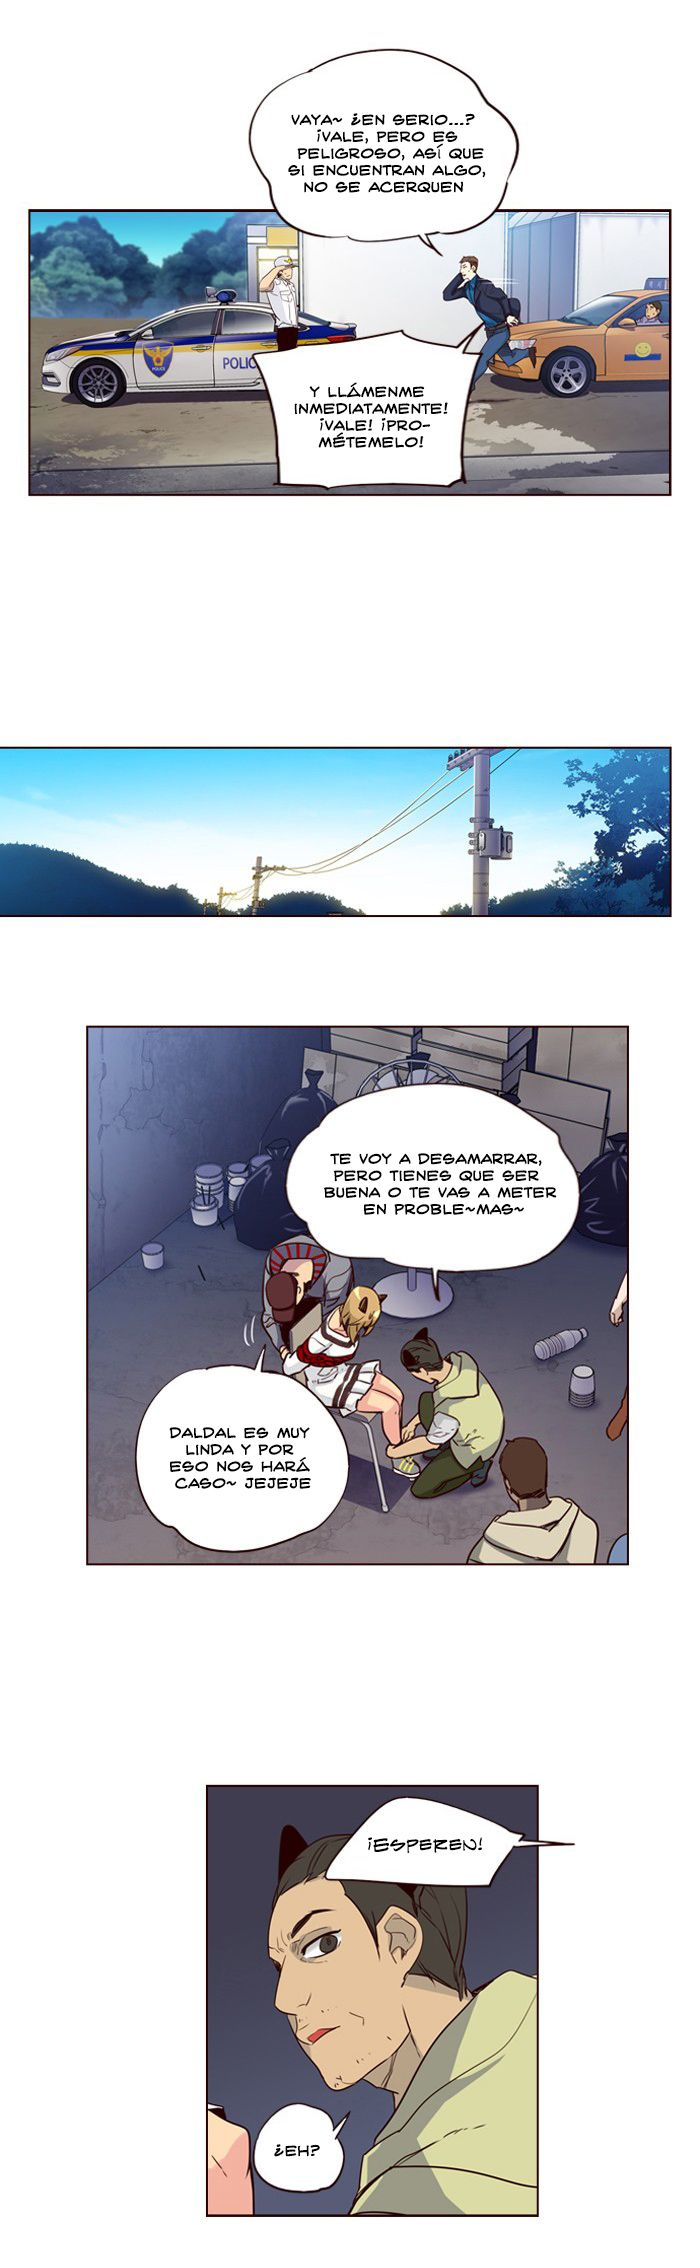 http://c5.ninemanga.com/es_manga/pic2/32/416/515615/293d4b3062d071218312a5eb322a3a47.jpg Page 6